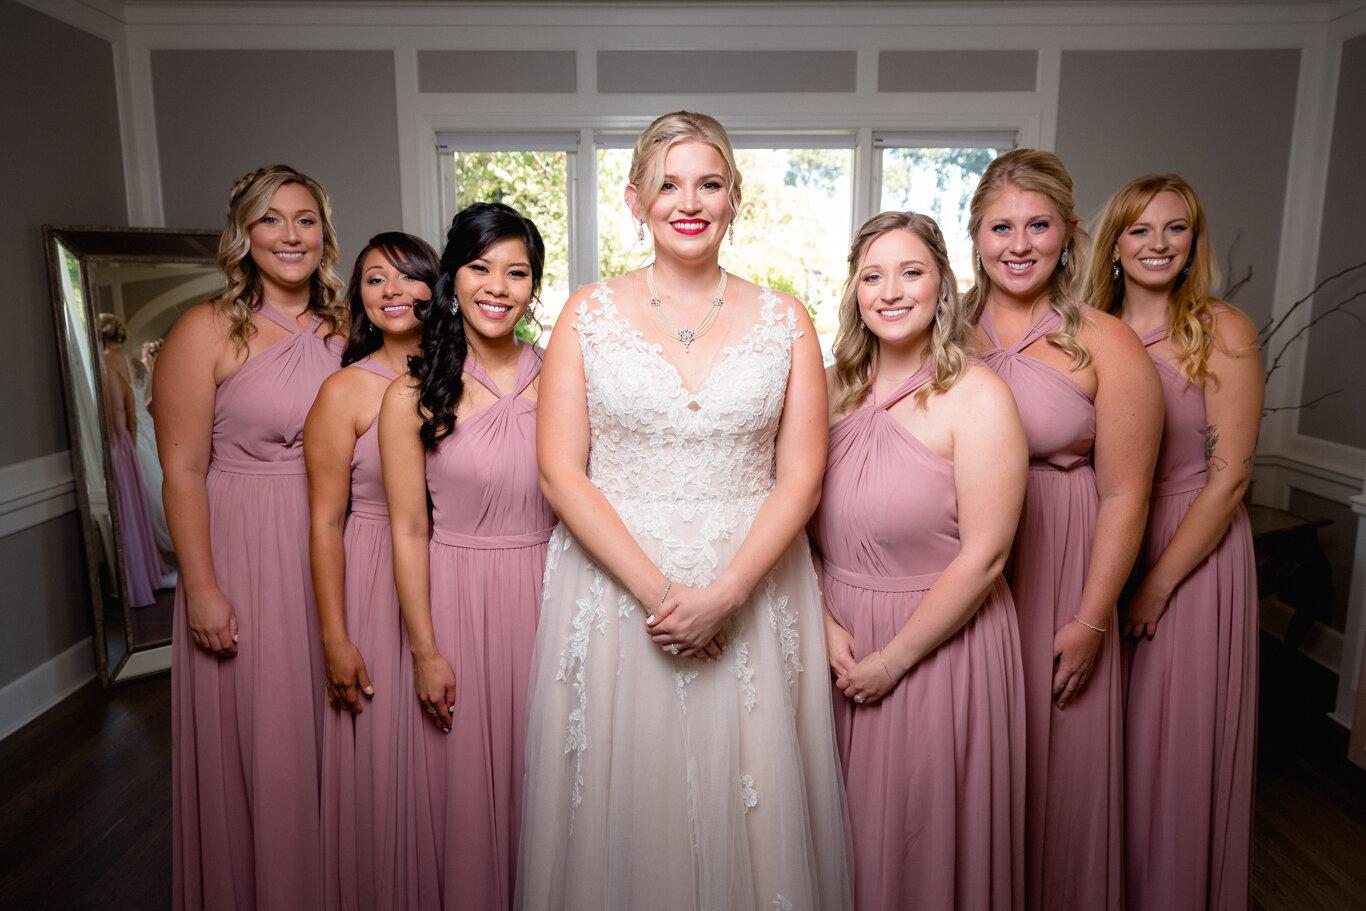 2019.08.24_Emily-Ashir-Wedding-at-the-Maples-5211.jpg